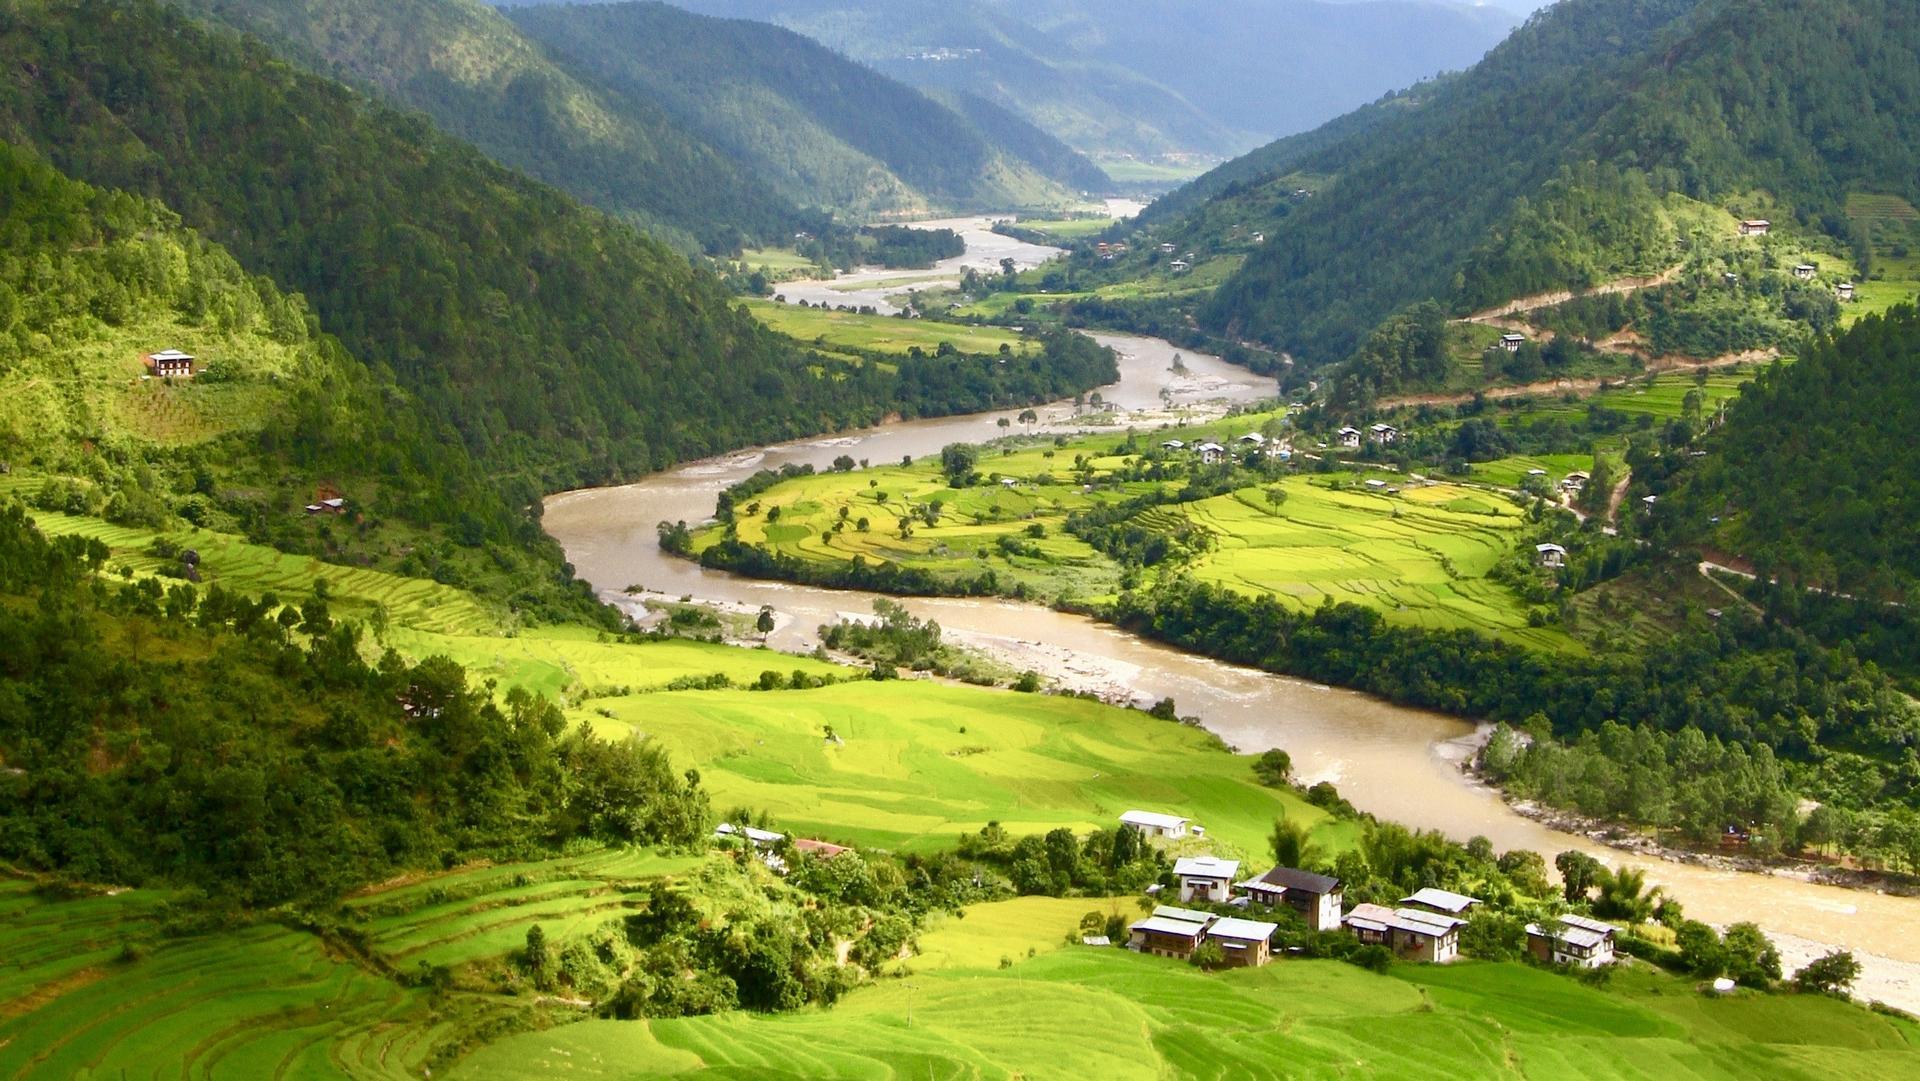 bhutan gallery02.jpg